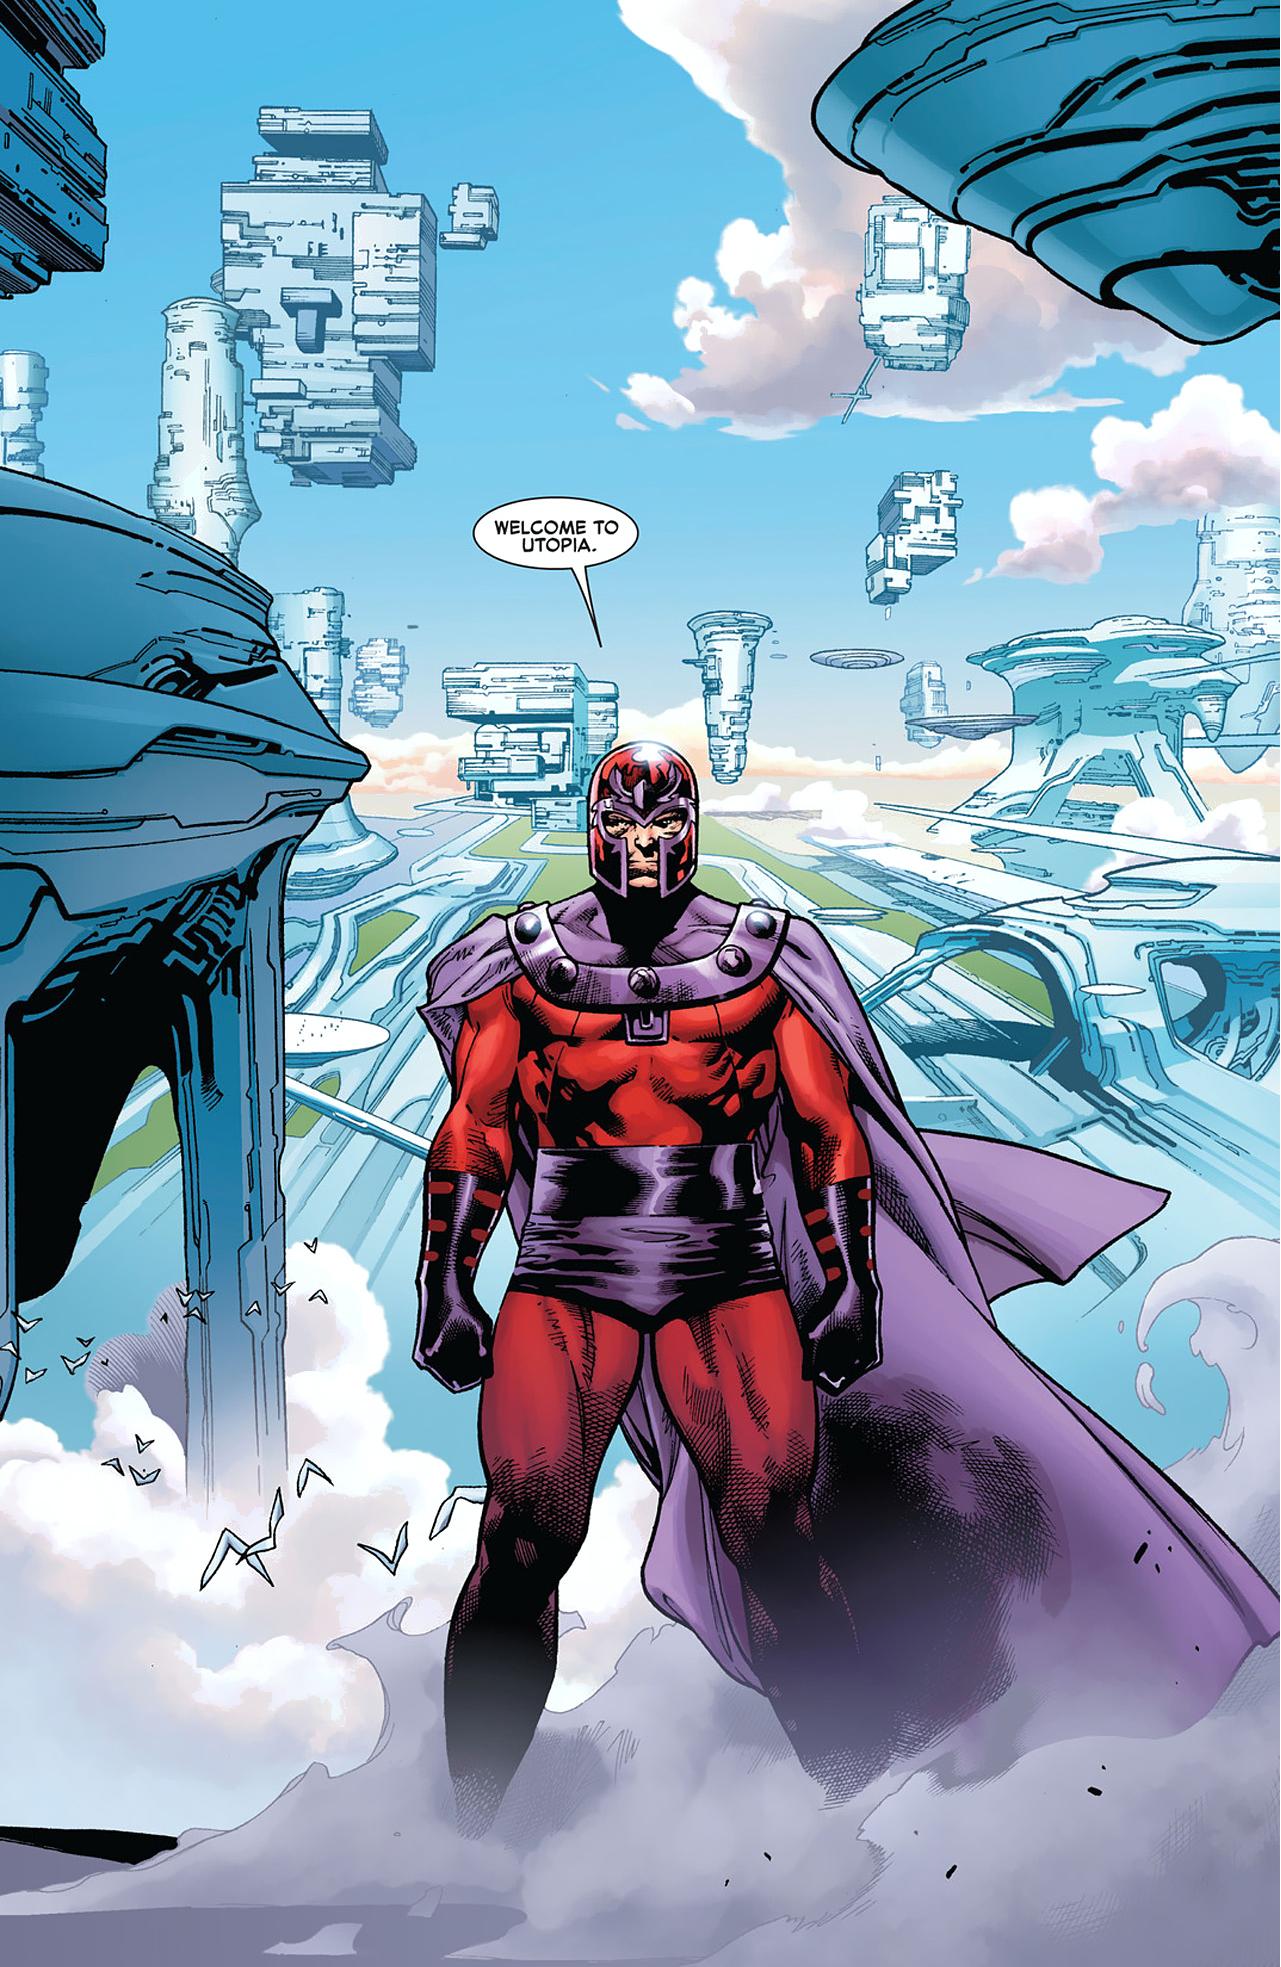 magneto welcomes professor x to utopia